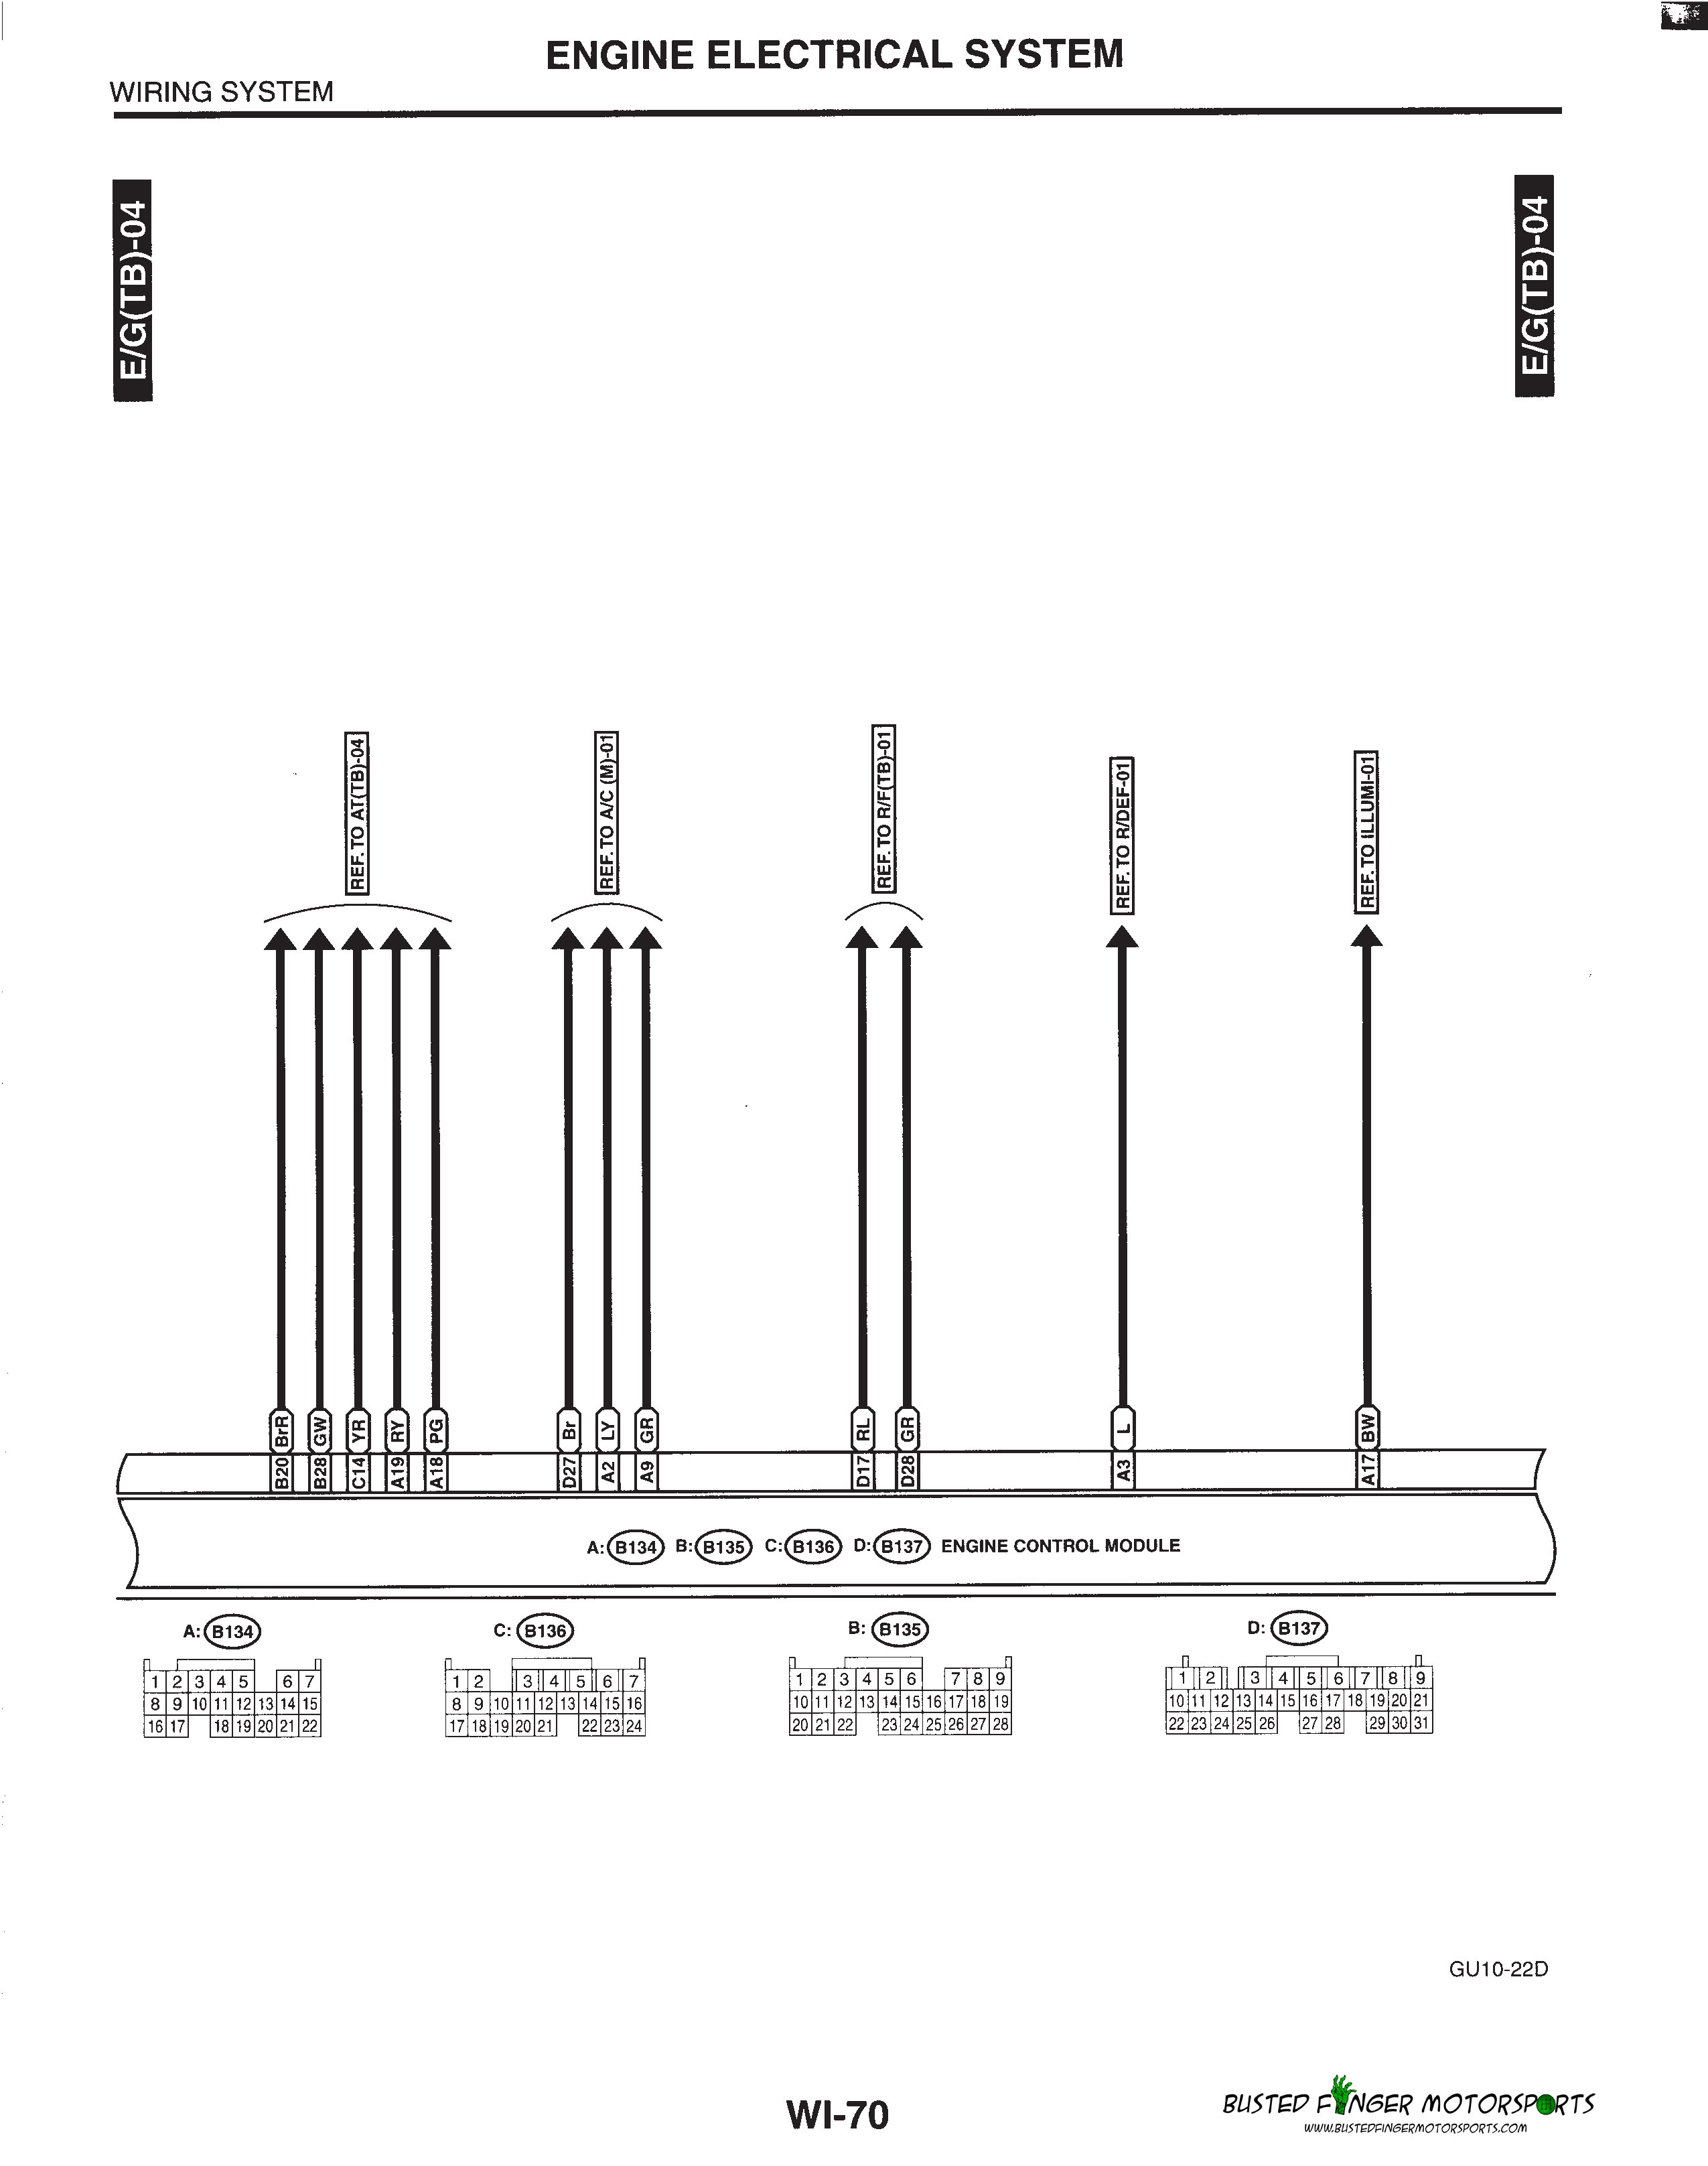 02 Wrx Engine Wiring Diagram Gibson Sg Special Wiring Diagram